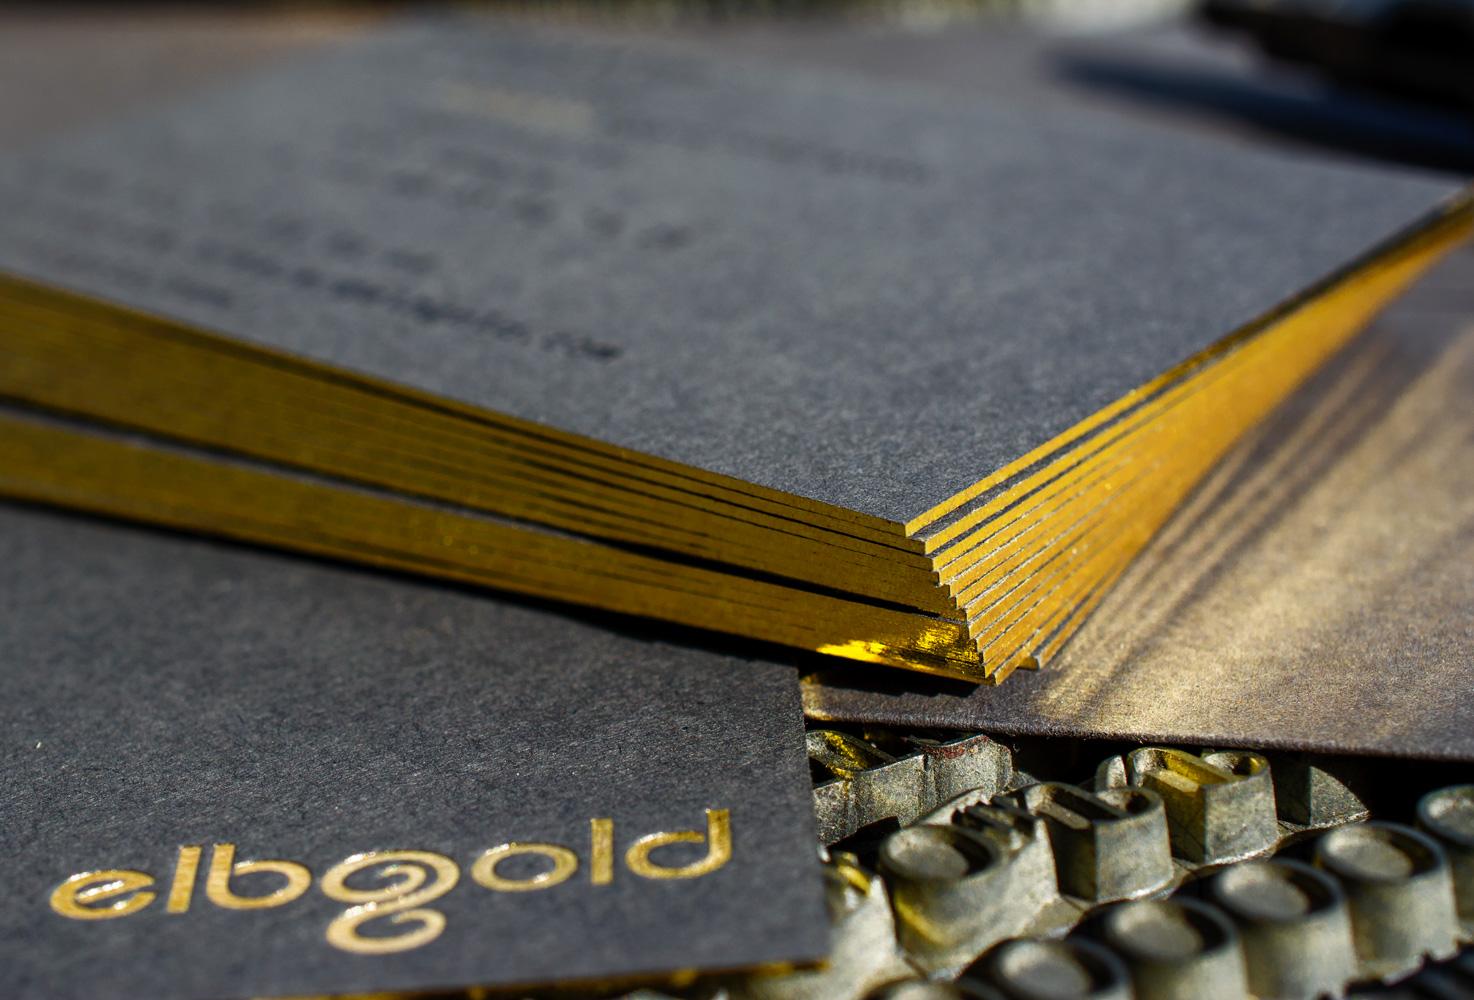 Goldschnitt und Folienschnitt als Schnittverzierung